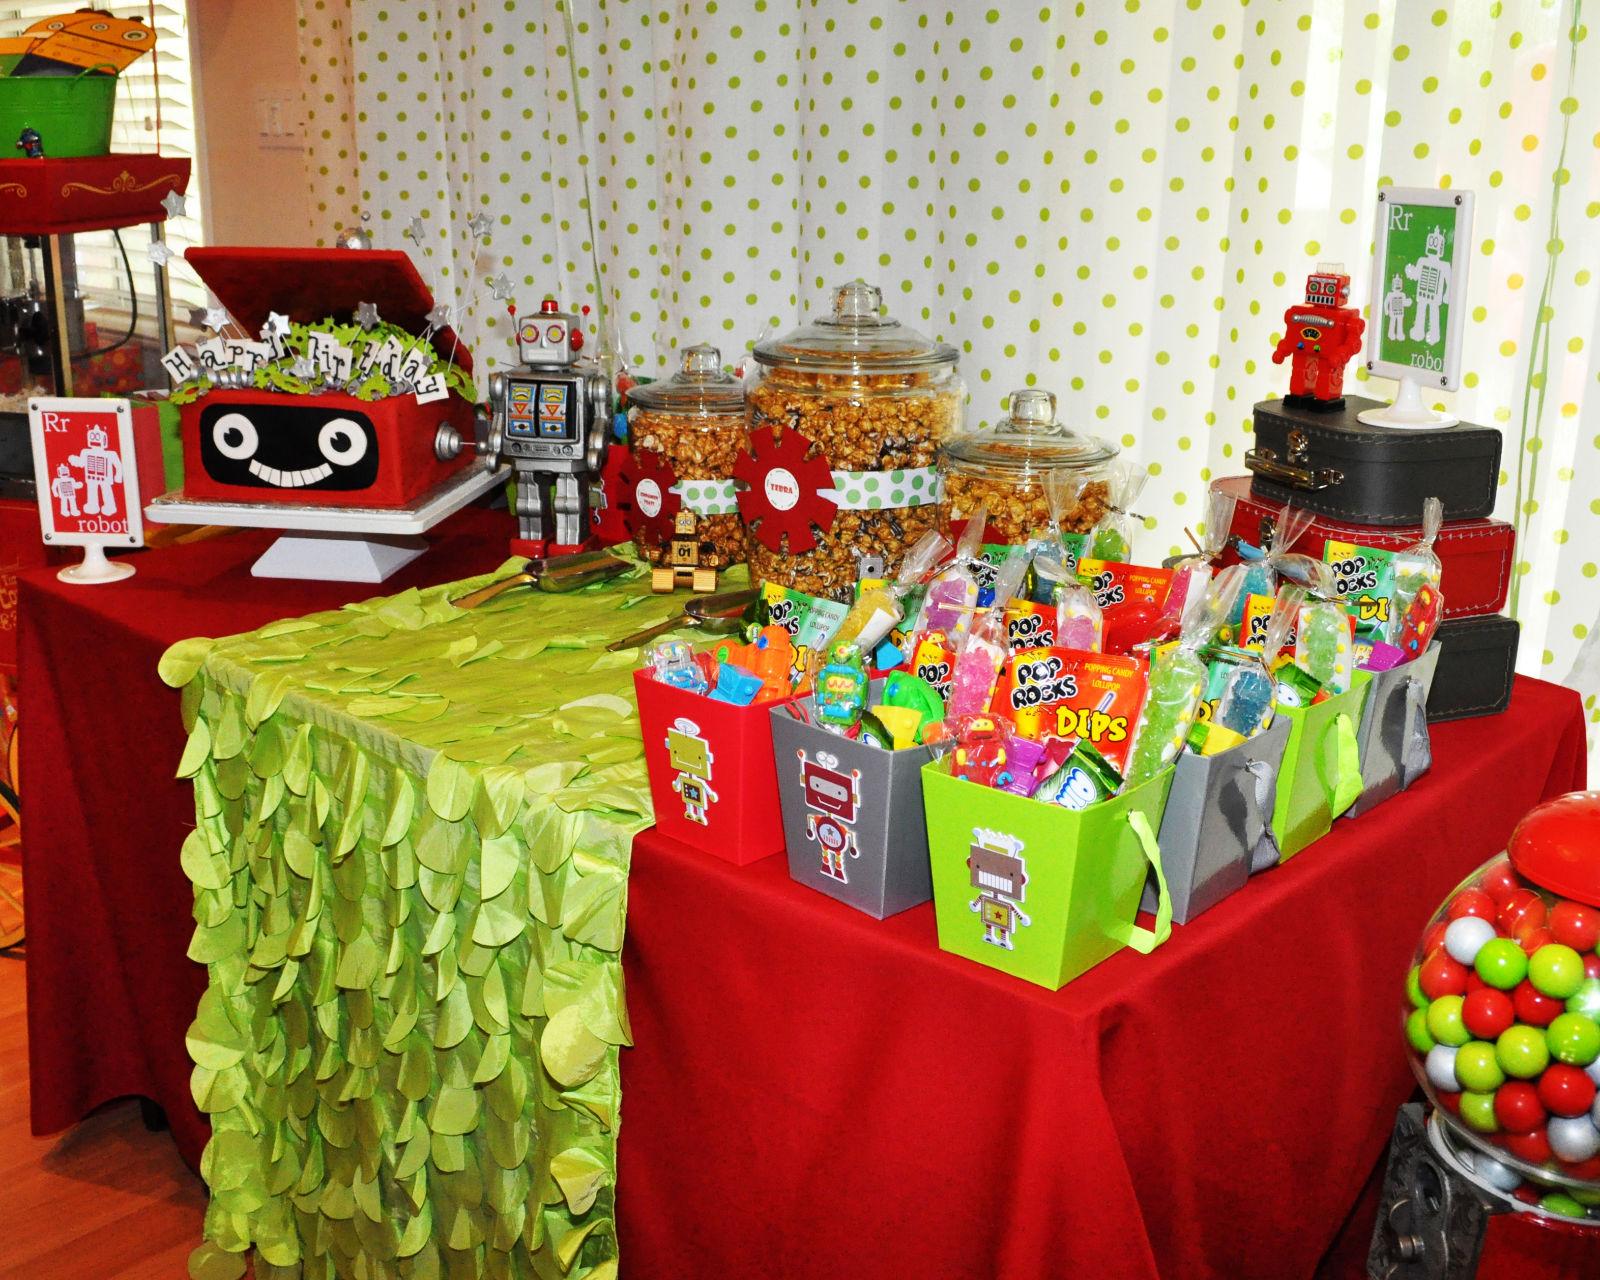 Robot Birthday Decorations: Robot & Rockets Birthday Party